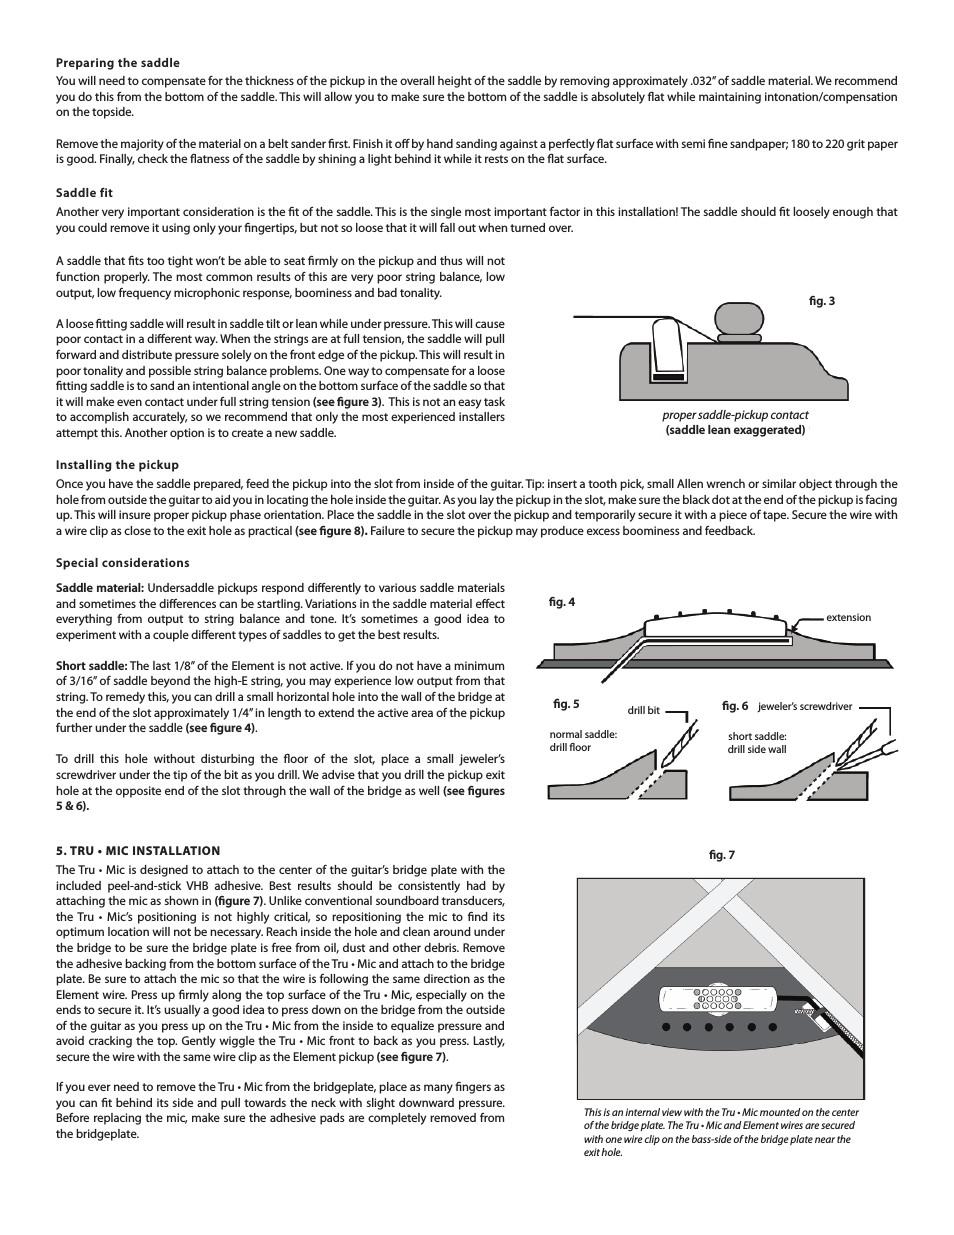 Kib M2401 Installation Manual Lr Baggs Anthem Sl Installation Manual User Manual Of Kib M2401 Installation Manual